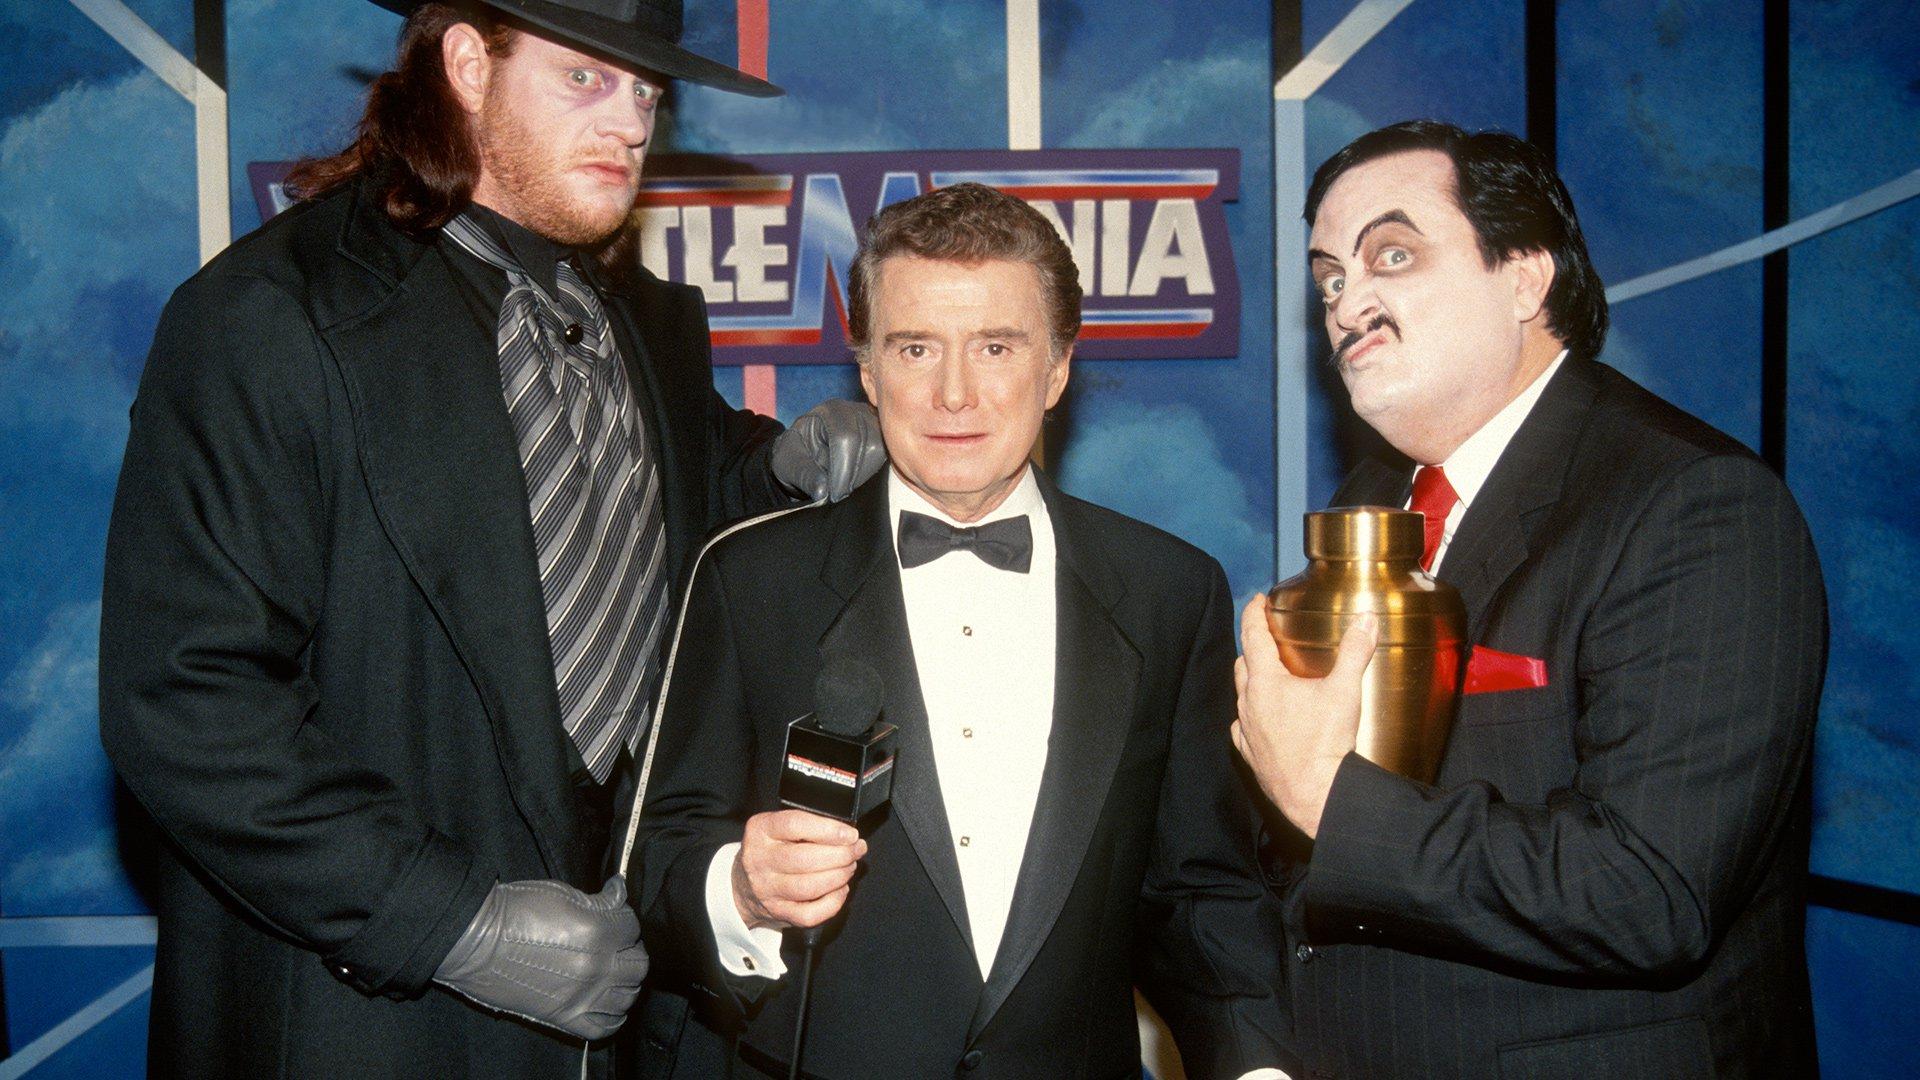 Regis Philbin interview The Undertaker à WrestleMania VII